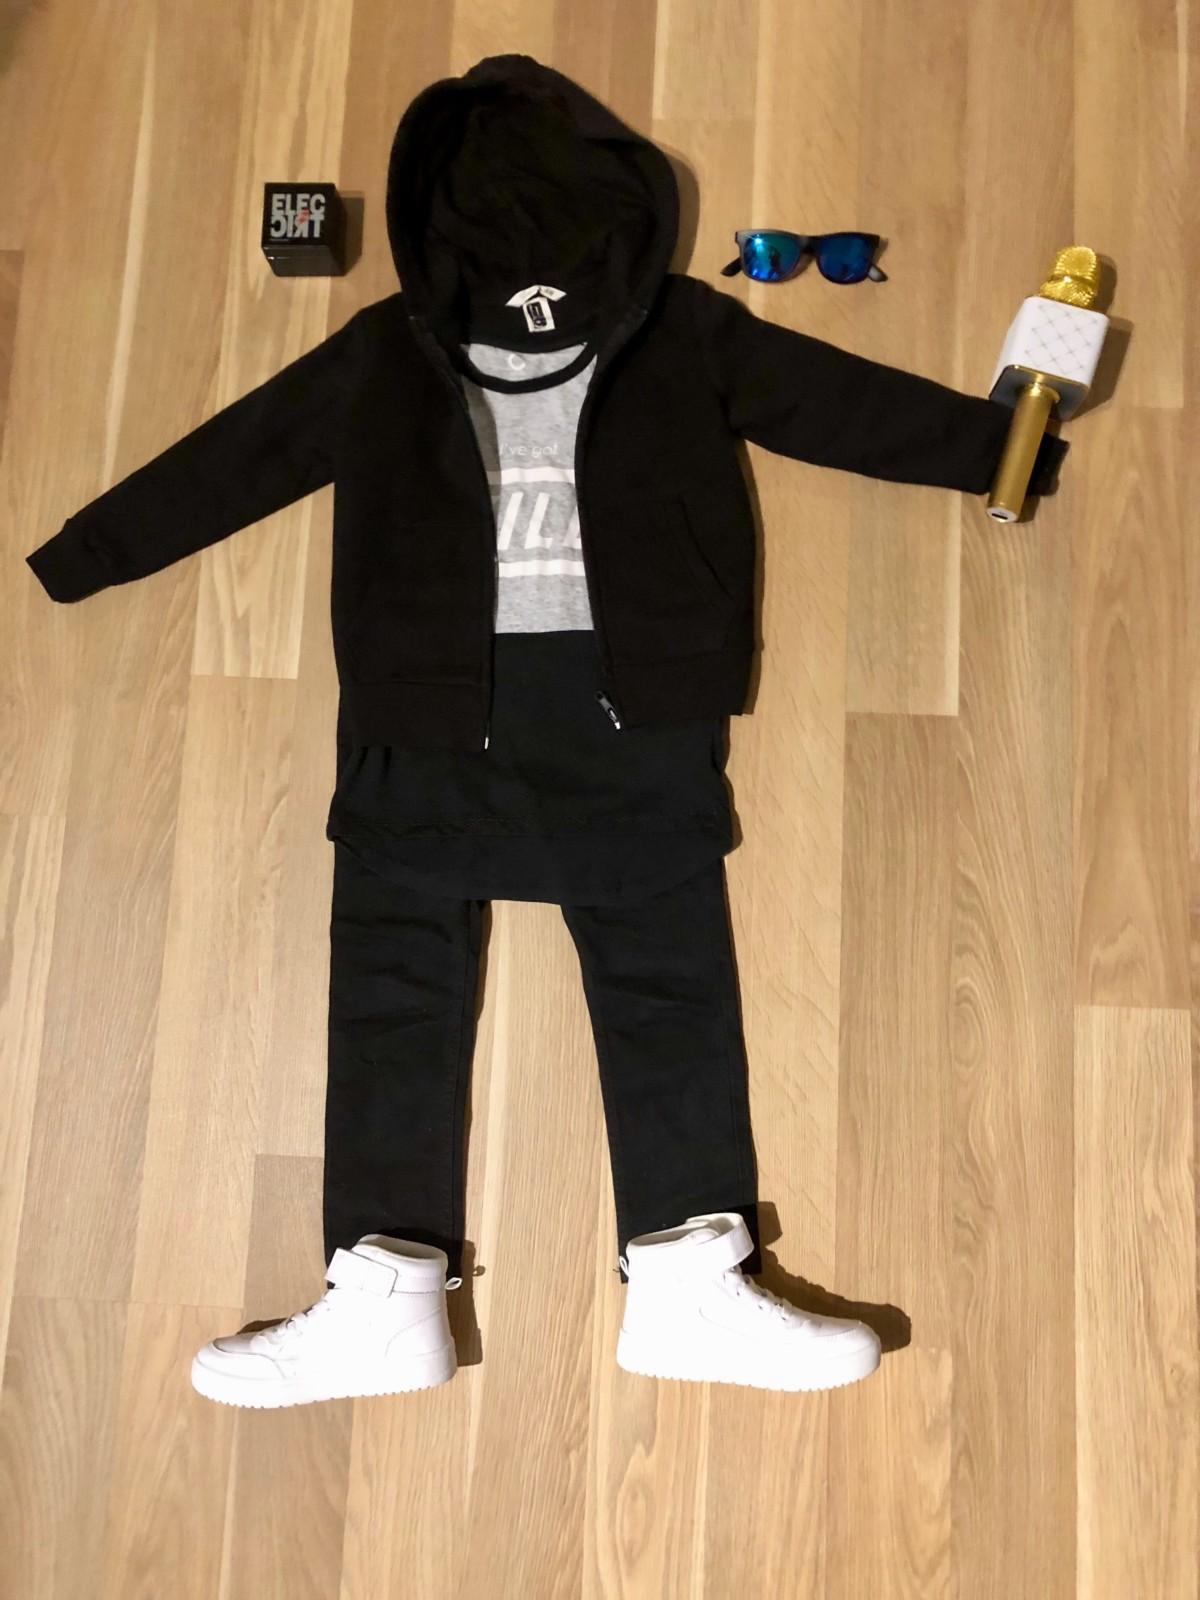 DIY kostyme